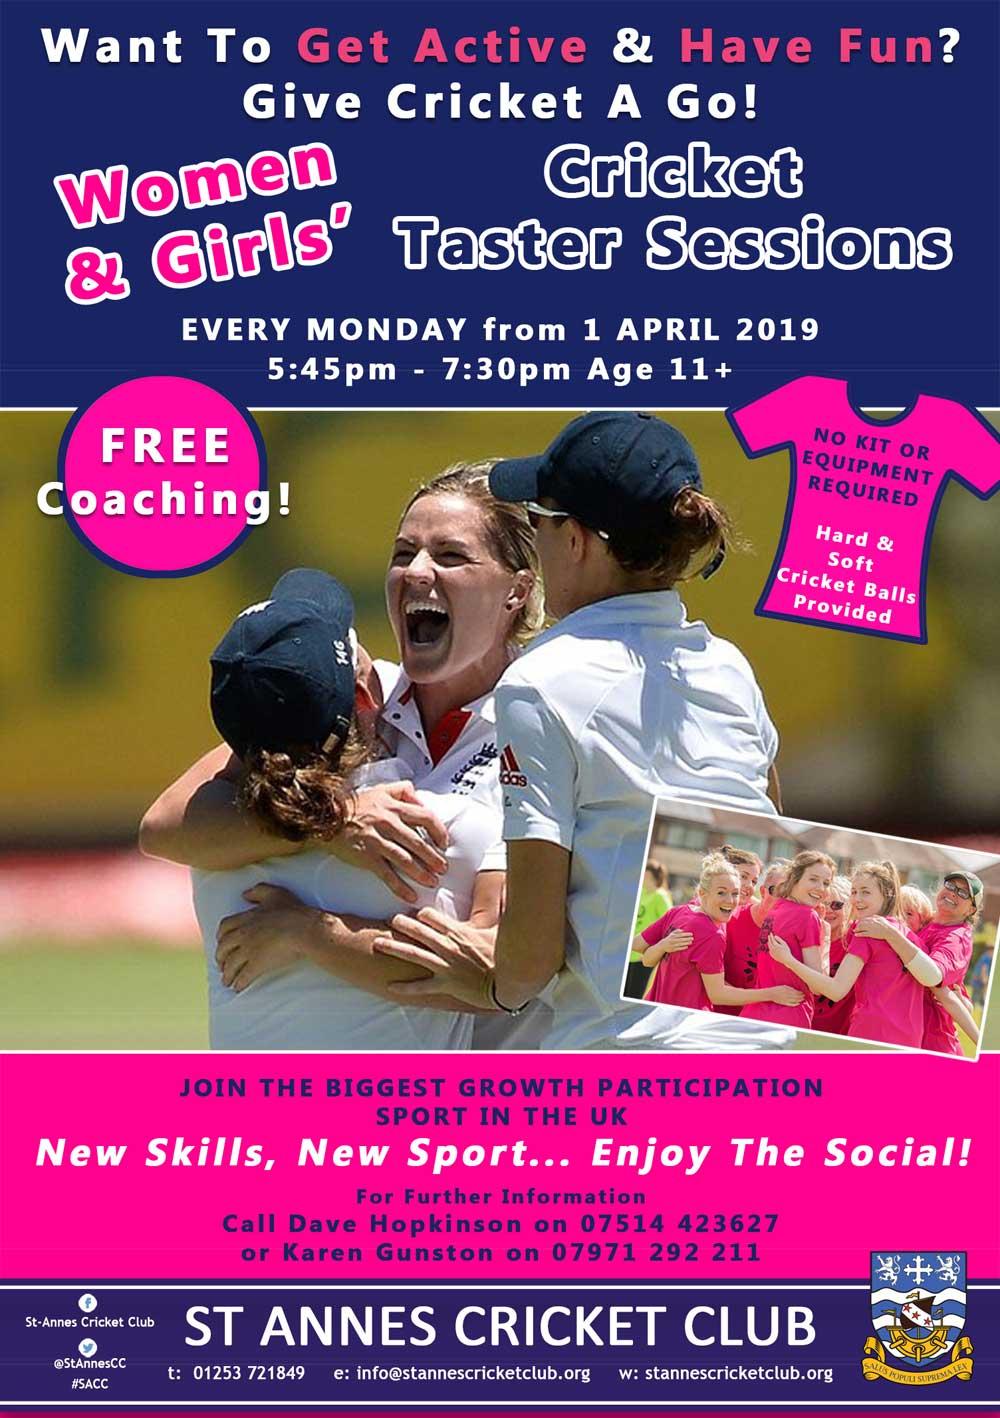 Enjoy the social, enjoy Women & Girls Cricket at St Annes CC